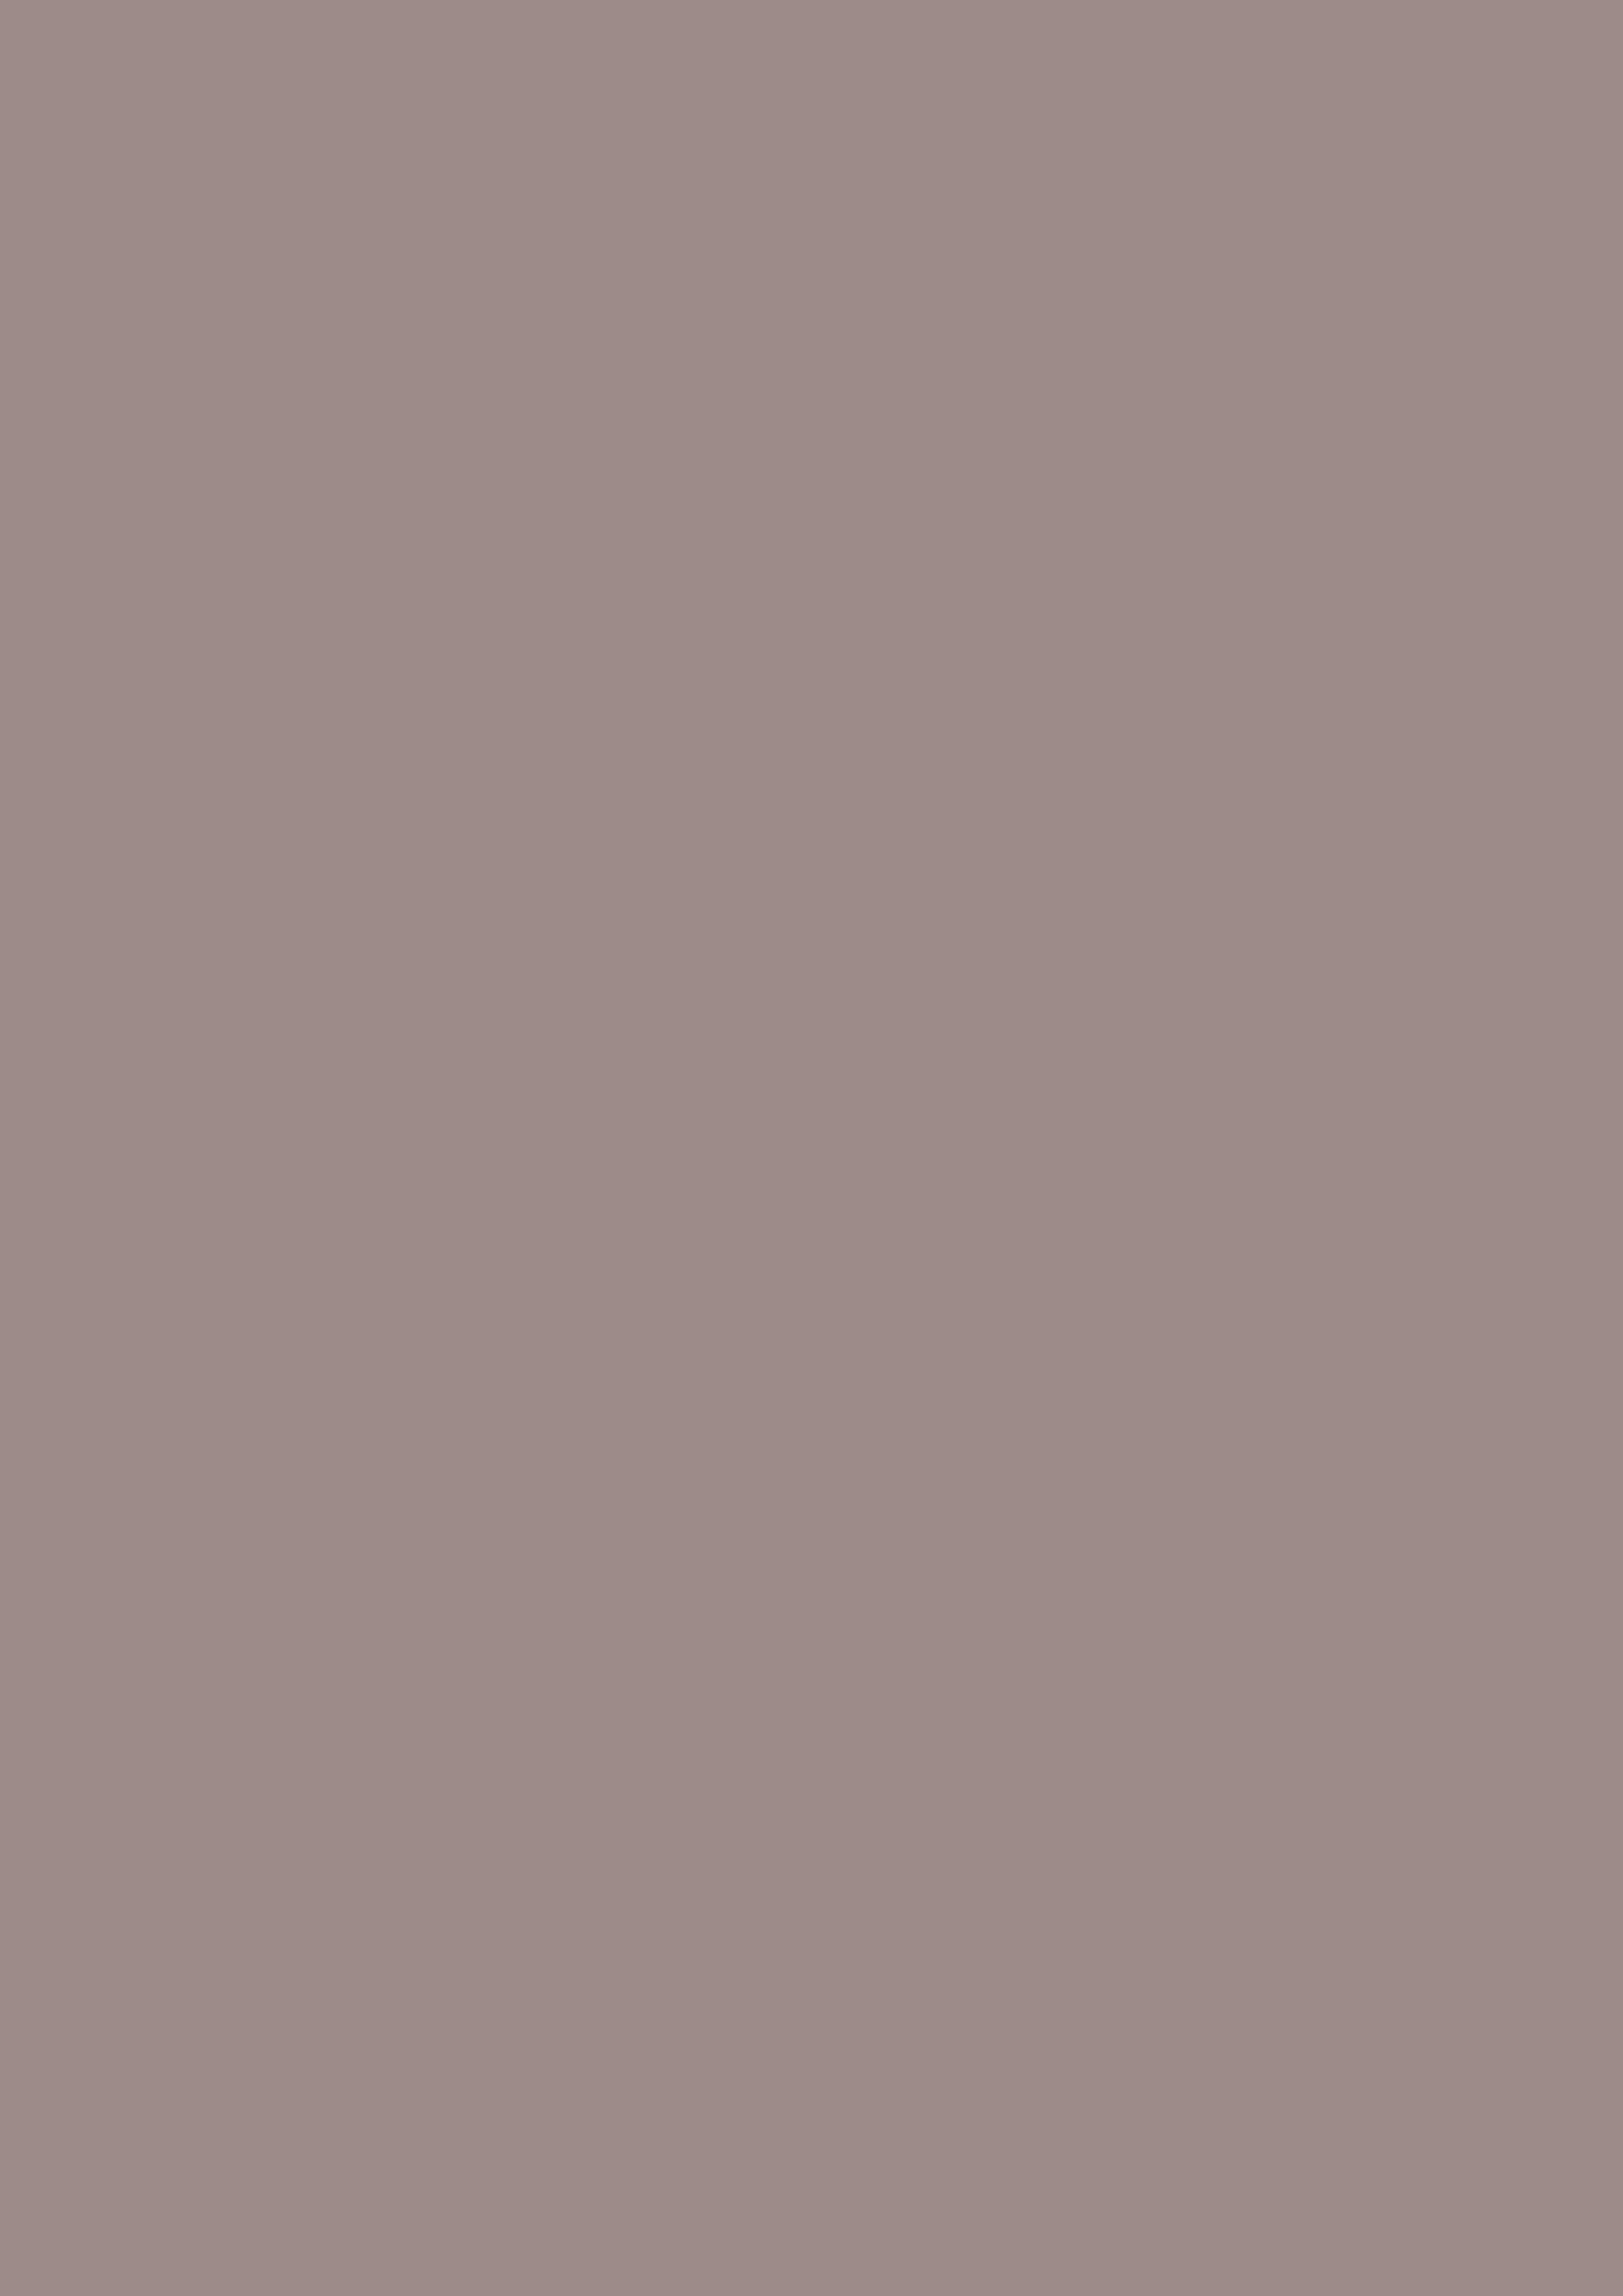 Charleston gray adler wohndesign for Wohndesign charlottenburg